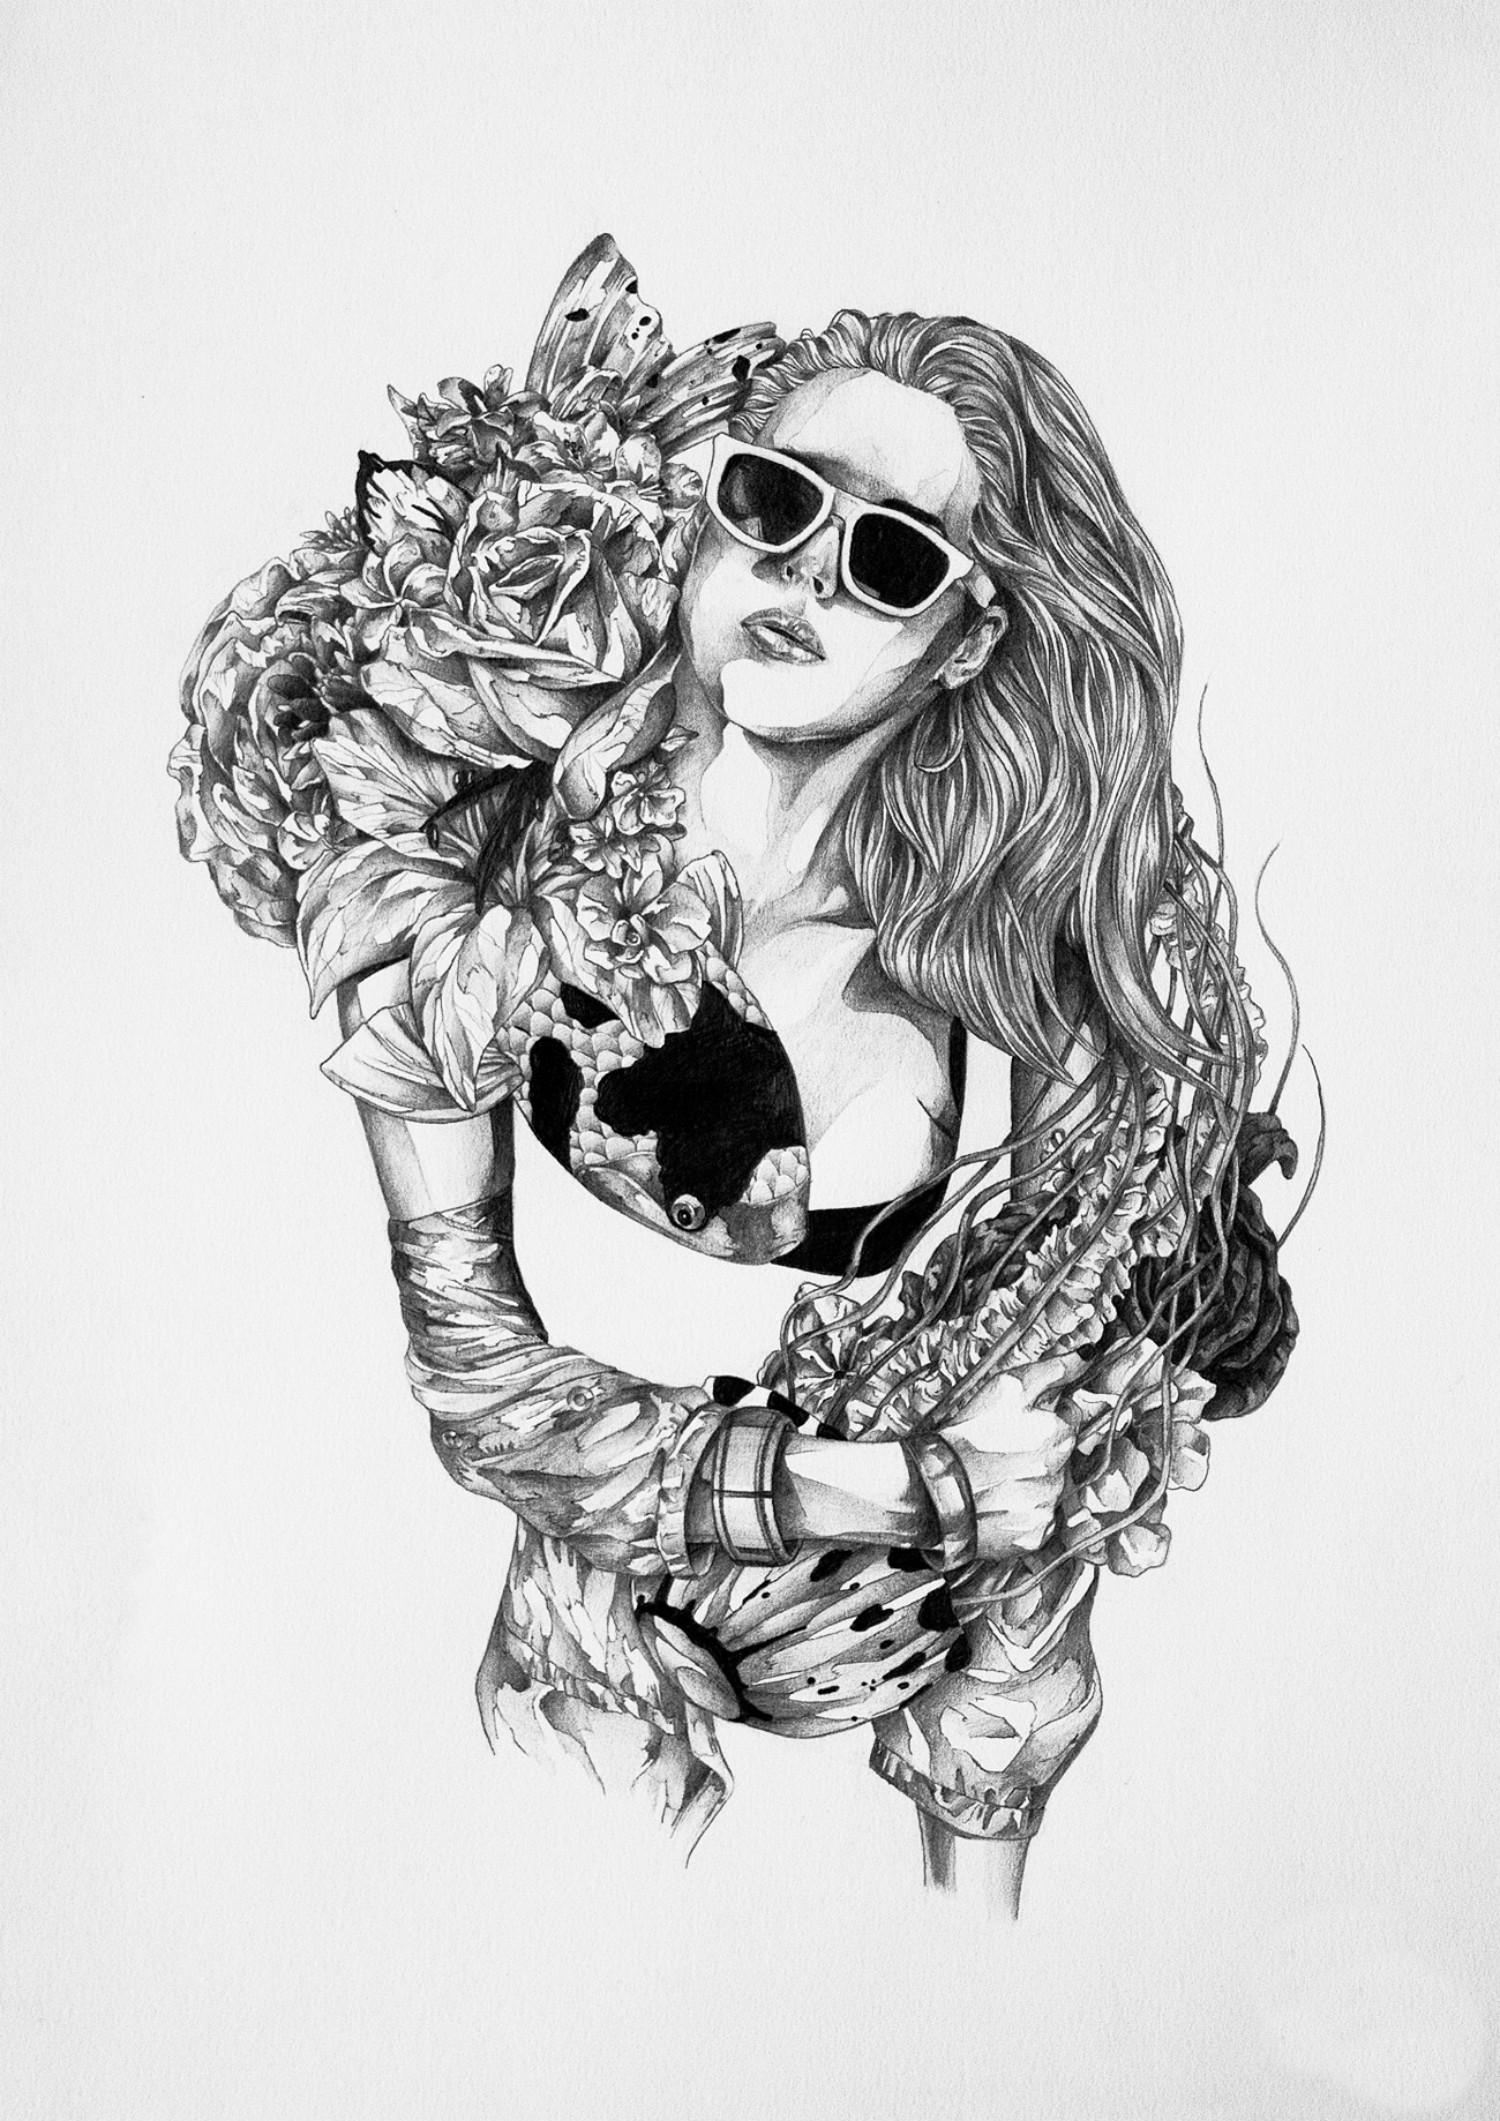 Ivan kamargio illustration 4